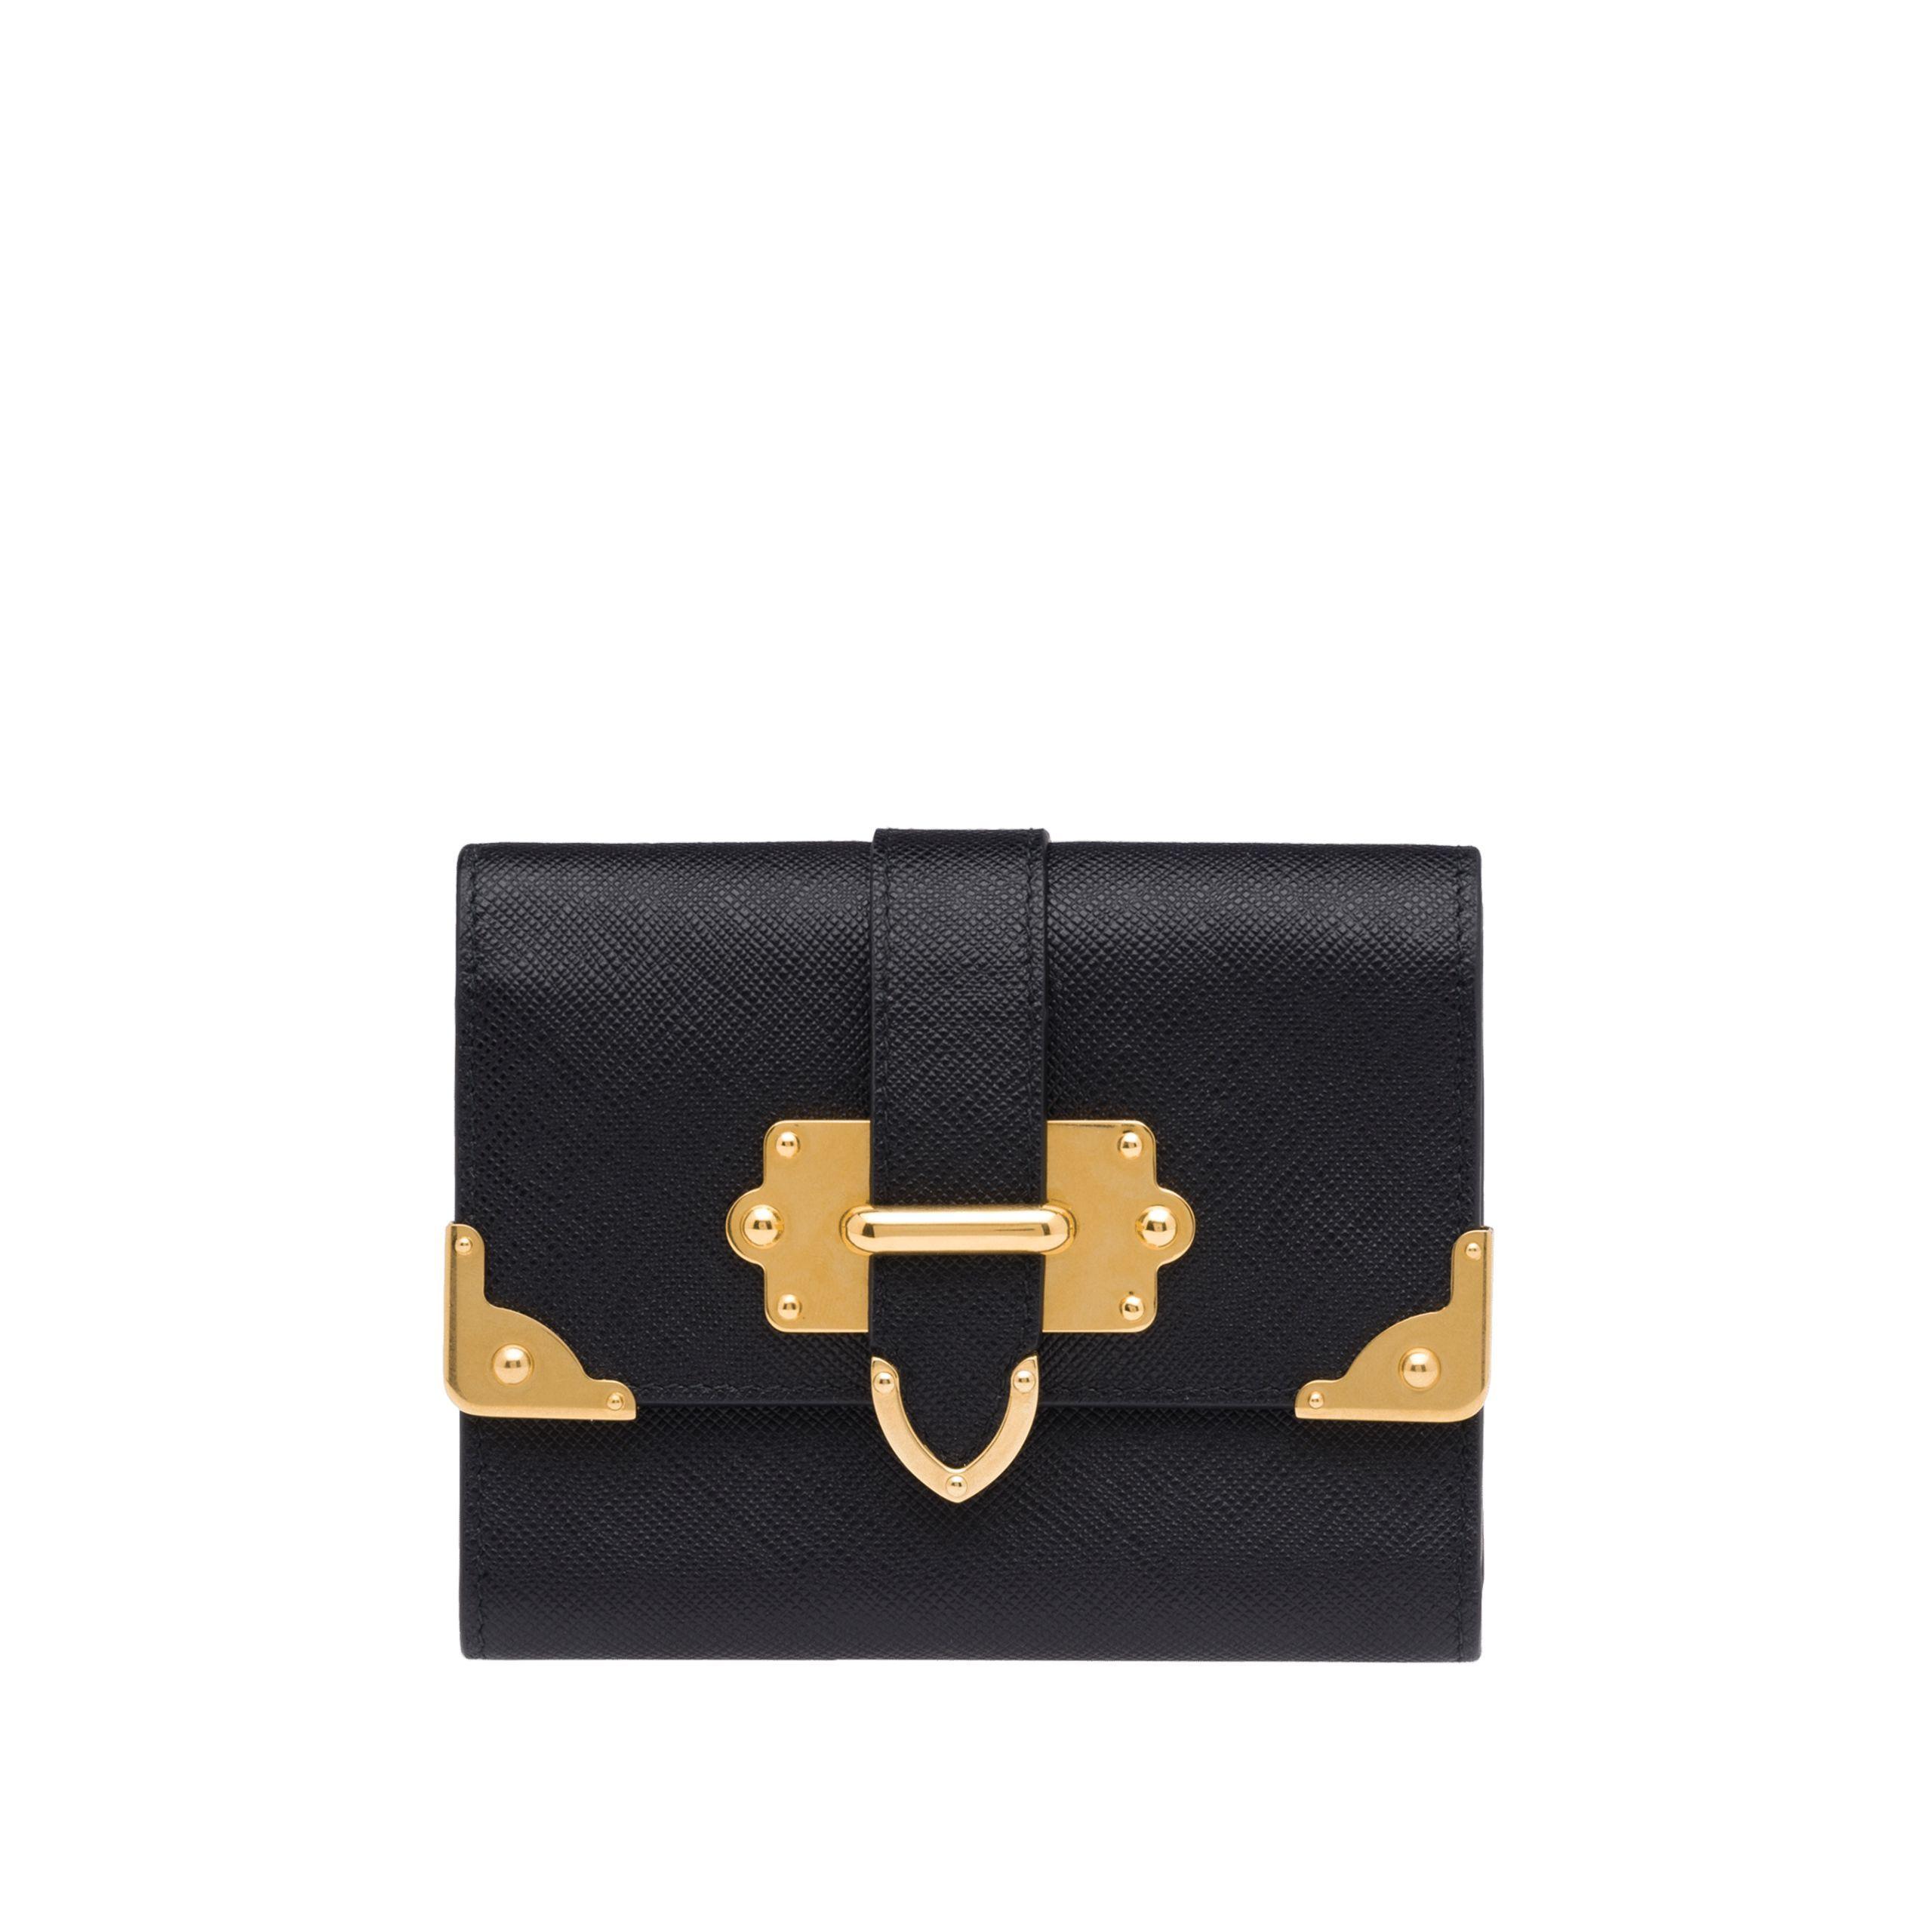 cc62aa0b PRADA | Medium Saffiano Leather Wallet | 590 $ | This Saffiano ...